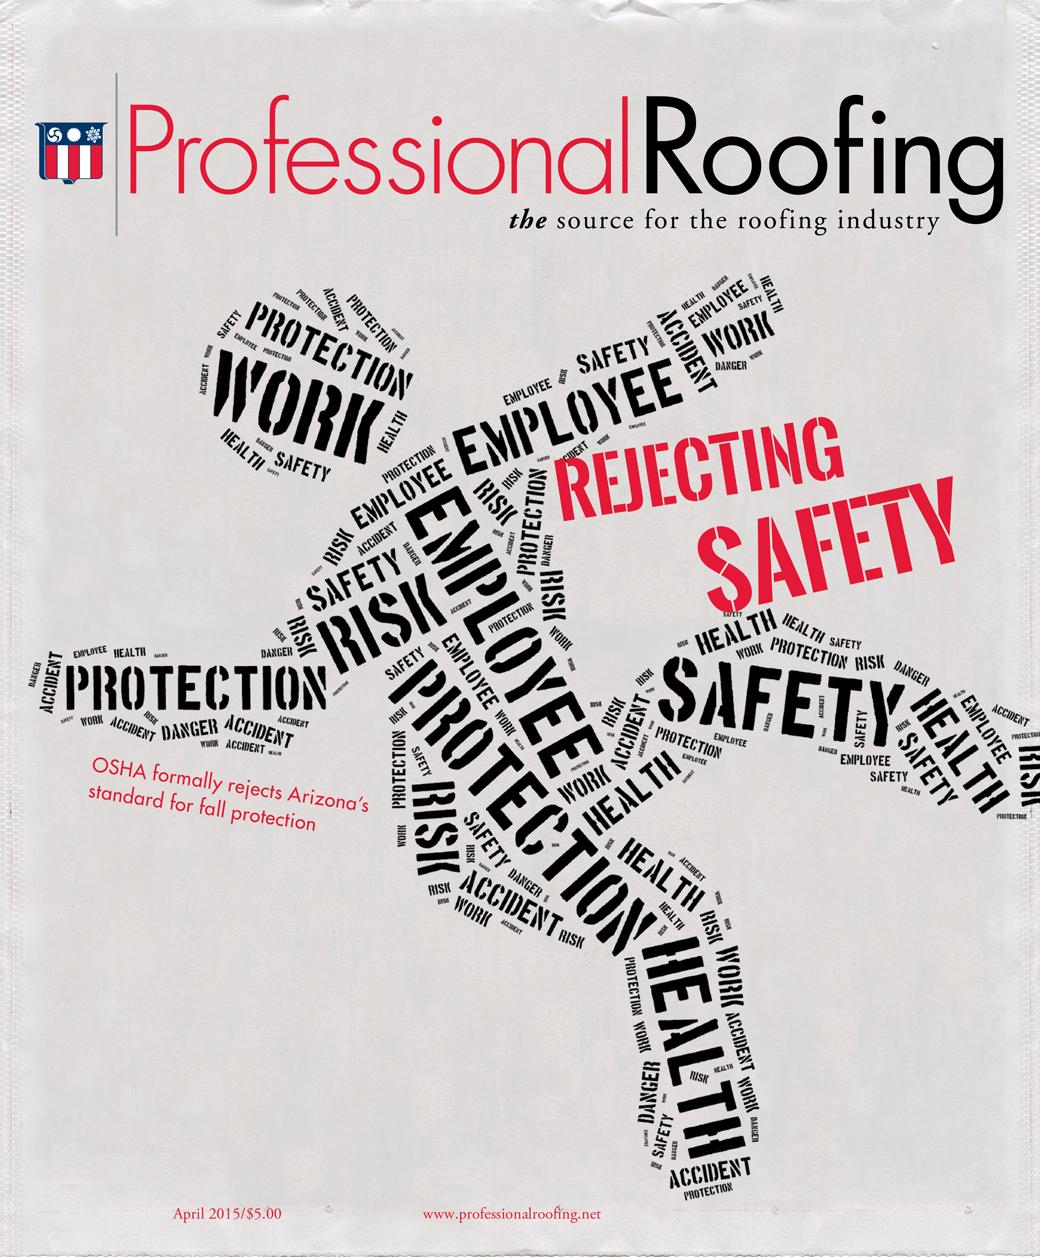 Professional Roofing Magazine 4/1/2015